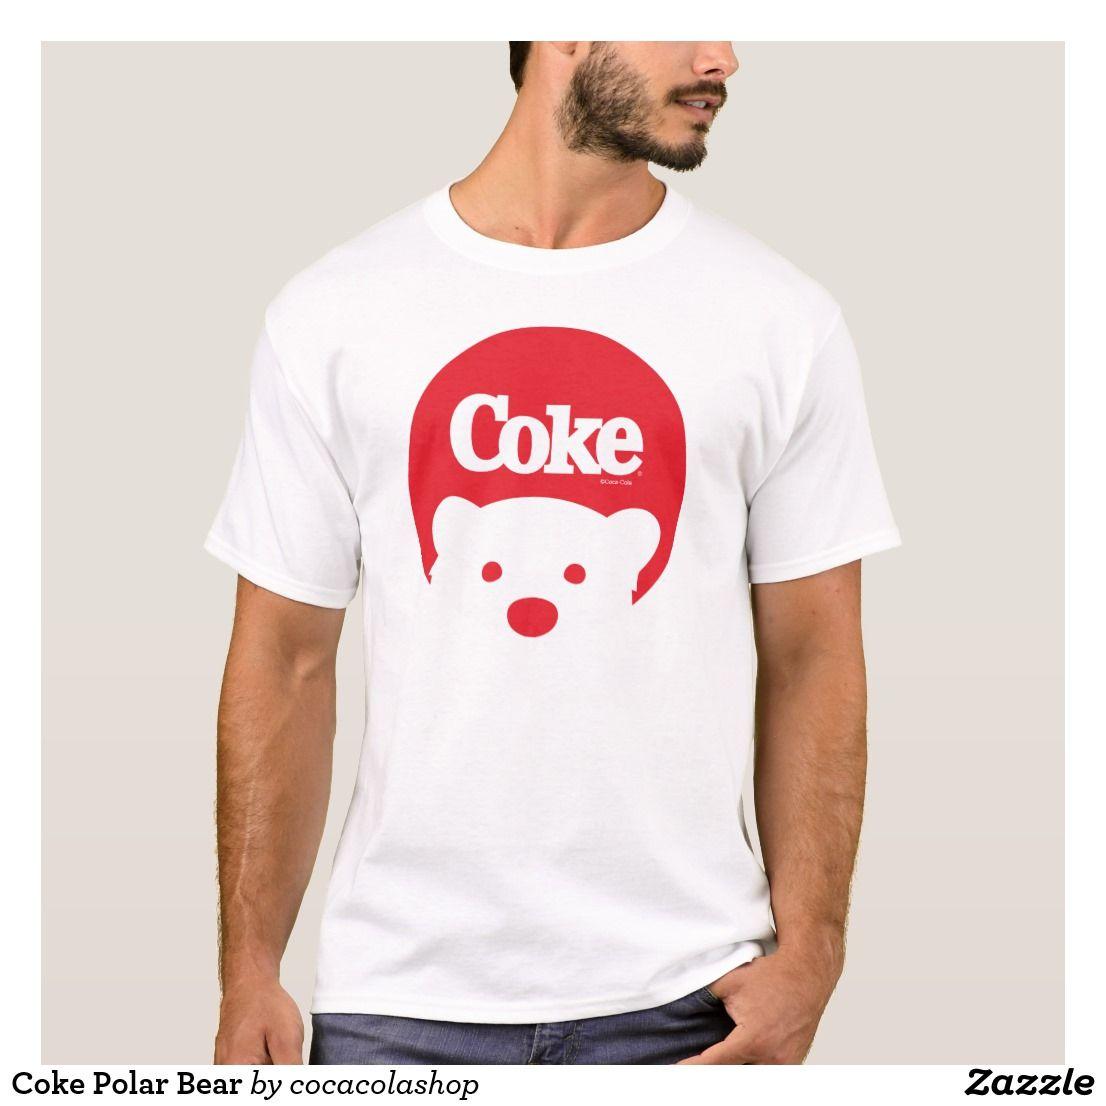 Coke Polar Bear TShirt (With images) Shirt designs